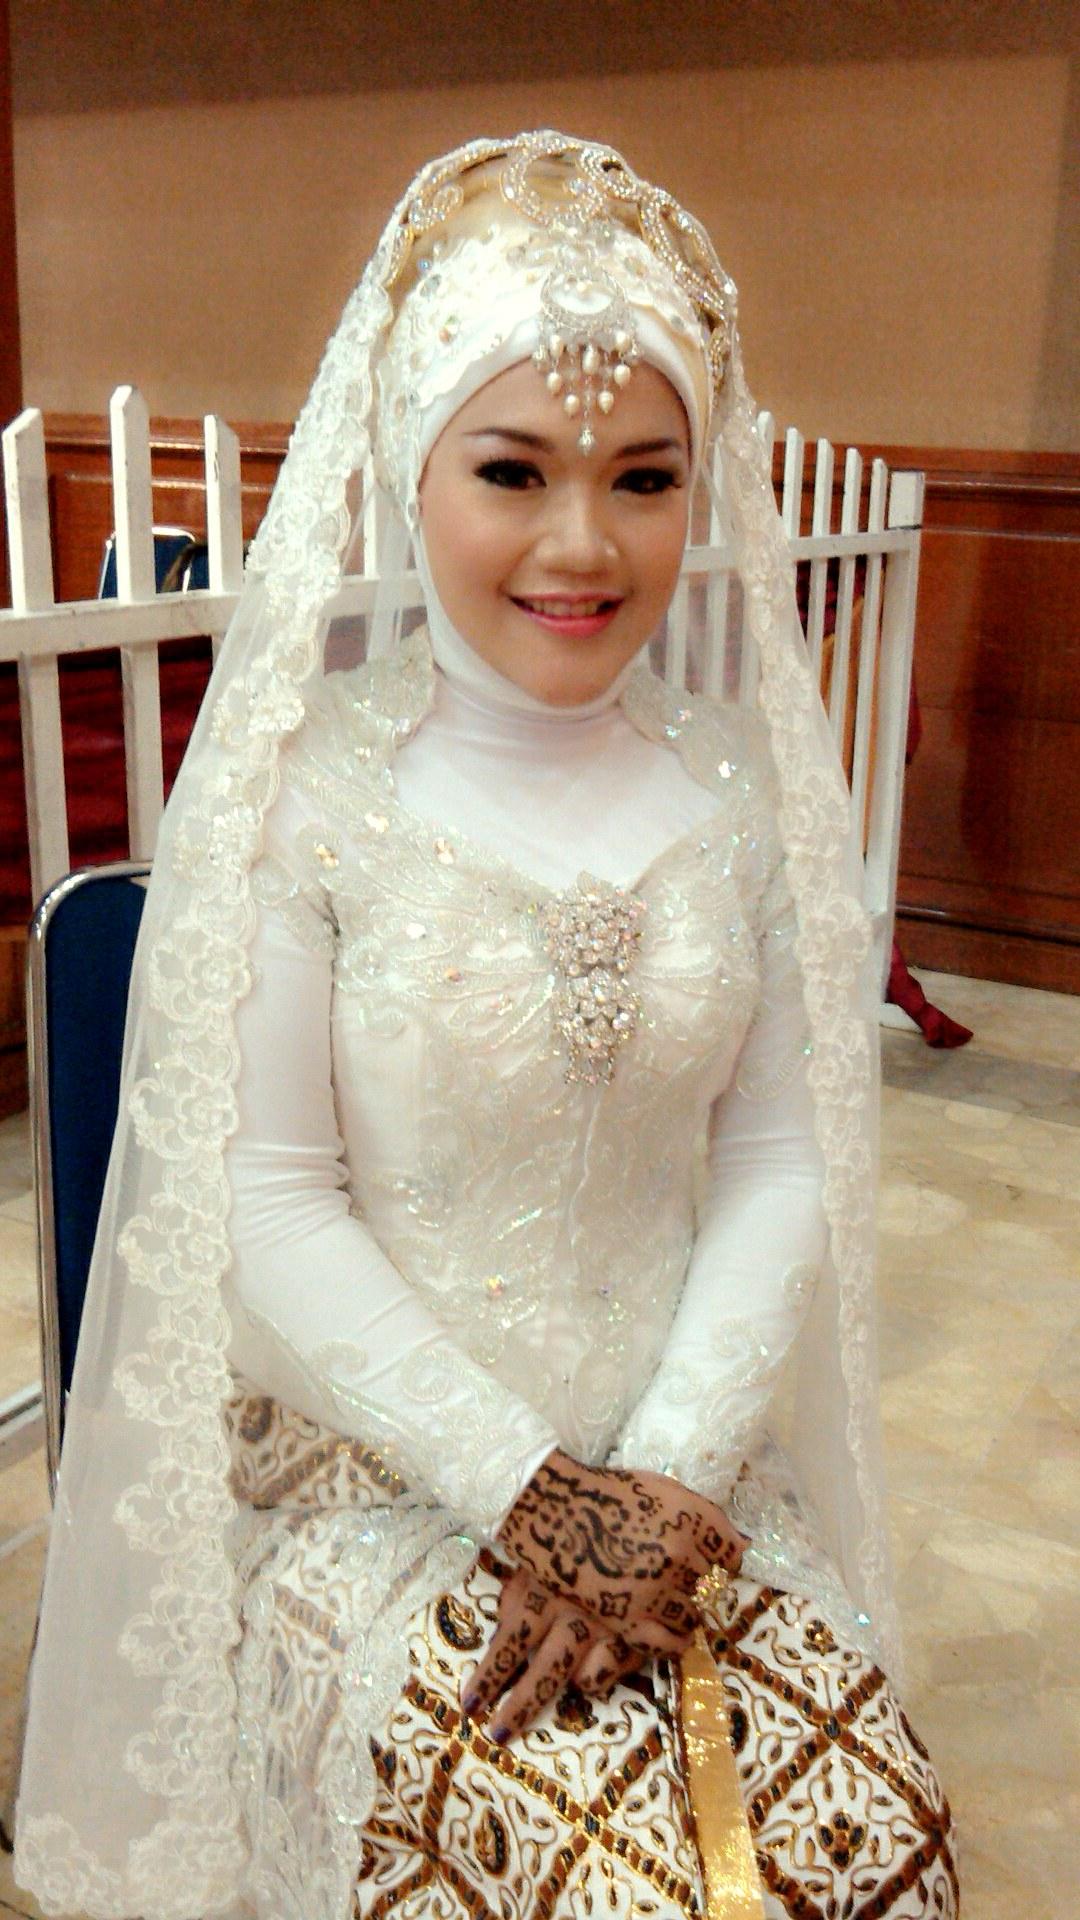 Design Gaun Pengantin Muslimah Syar'i Rabbani 3id6 Jilbab Pengantin Muslim Yang Syar I Dan Anggun